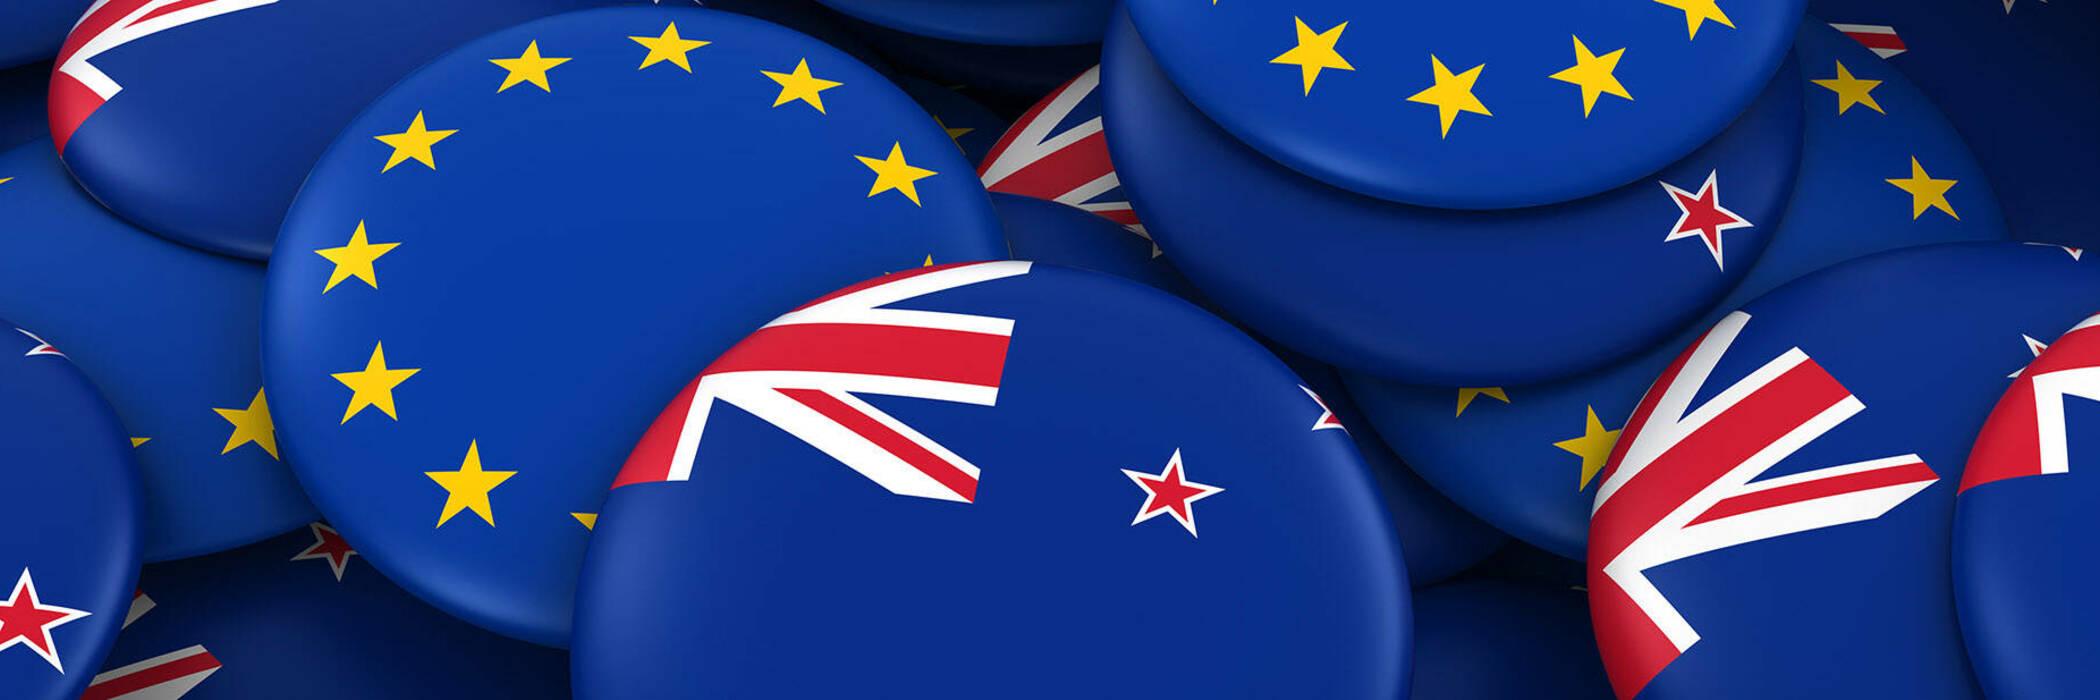 EU-NZ flag badges